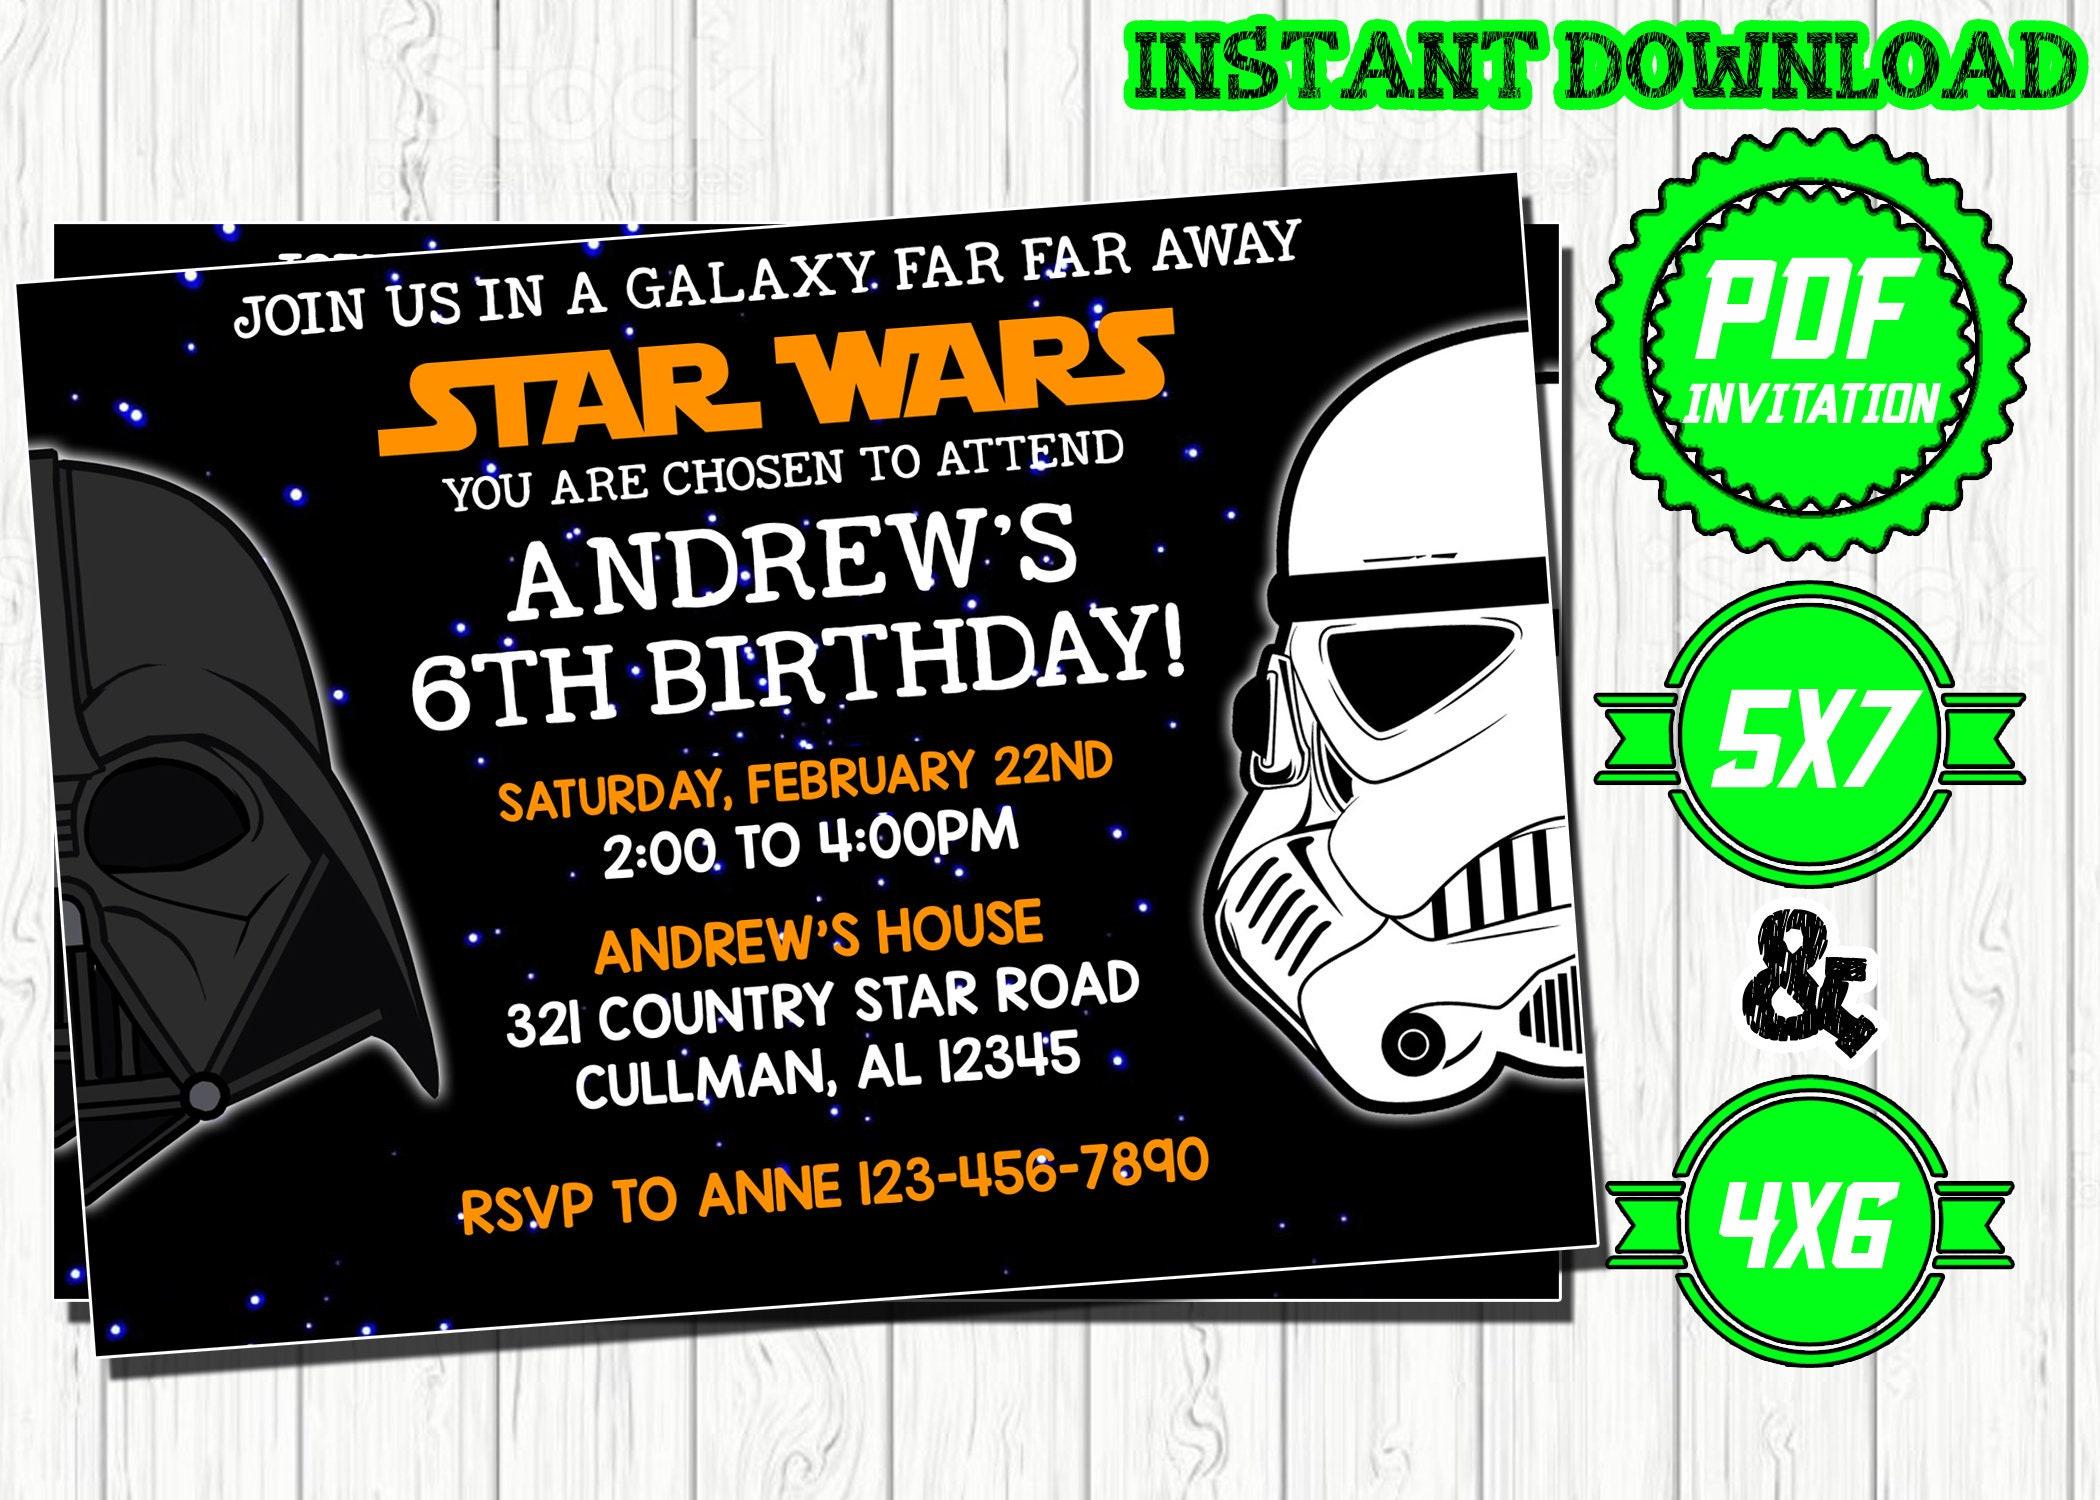 Star Wars Invitation Star Wars Birthday Star Wars Movie Party Starwars Invites Darth Vader Printables Instant Download Digital Card